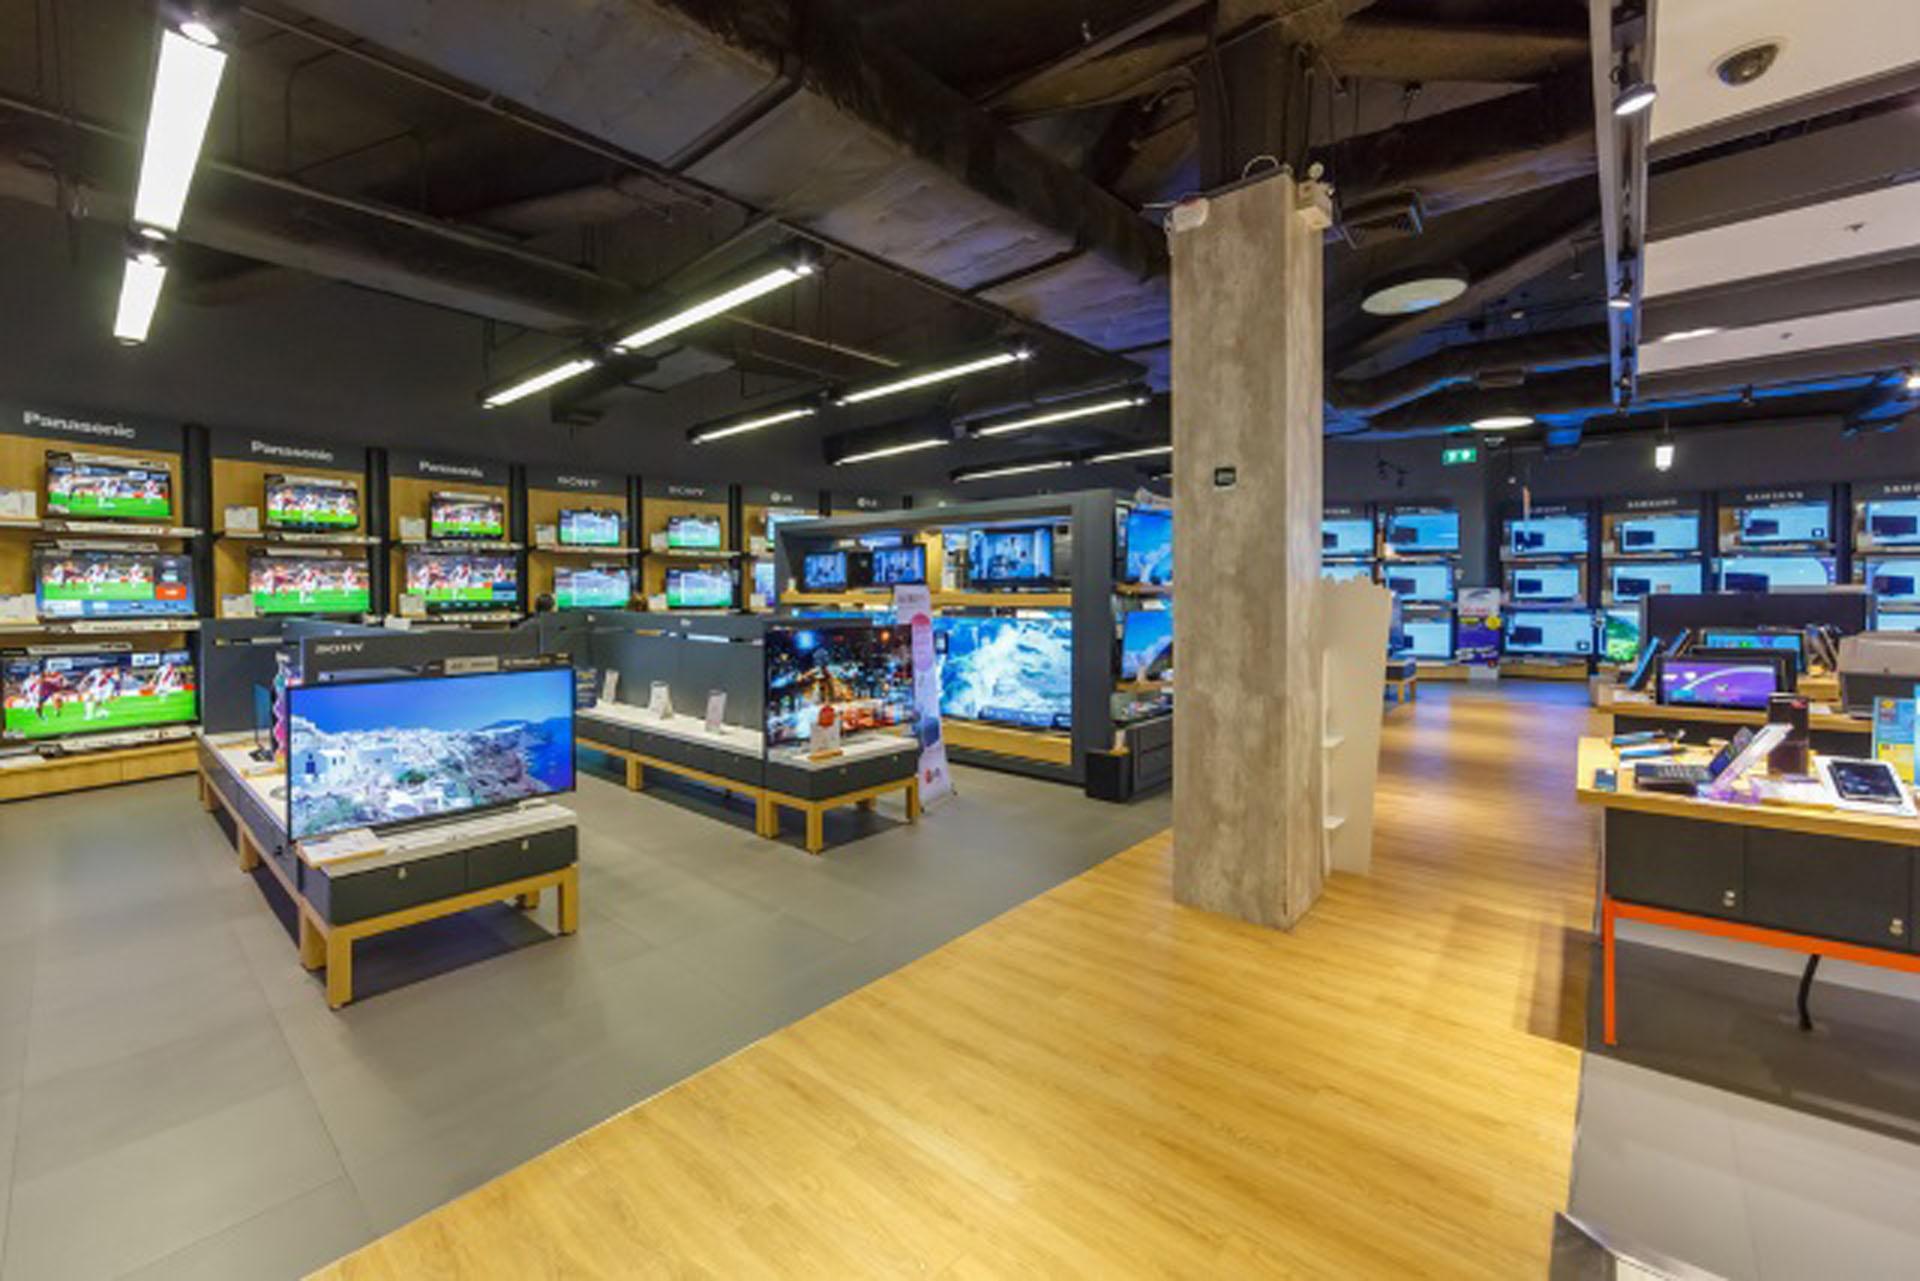 electronics-store-television-tv-generic-shutterstock_1522251711379.jpg